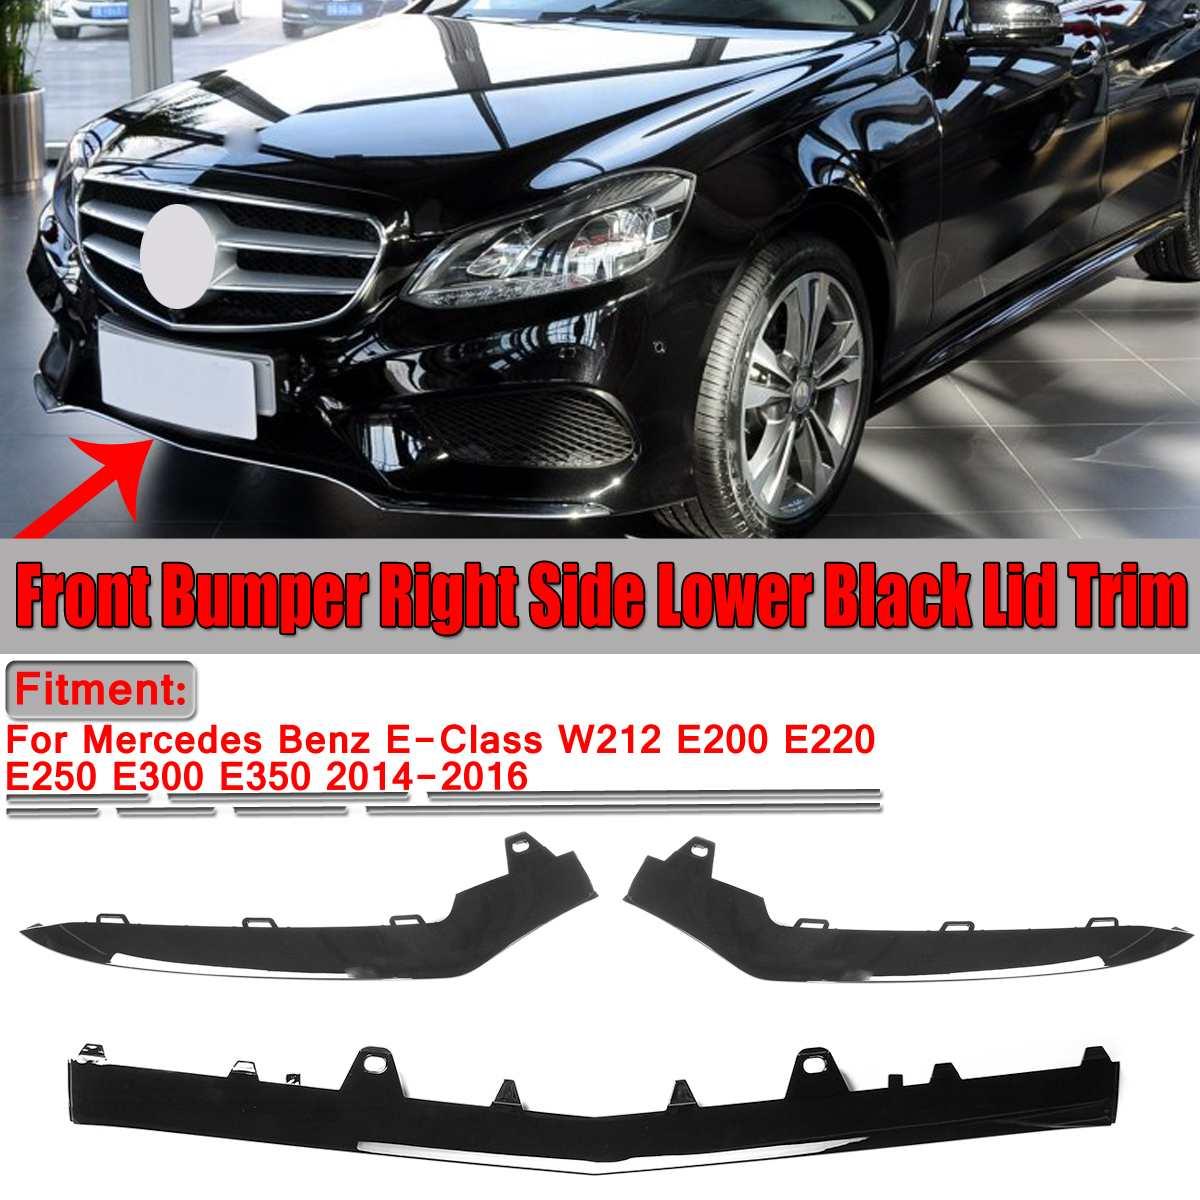 Front Bumper Left Side lower Chrome Trim Molding for Mercedes W207 E350